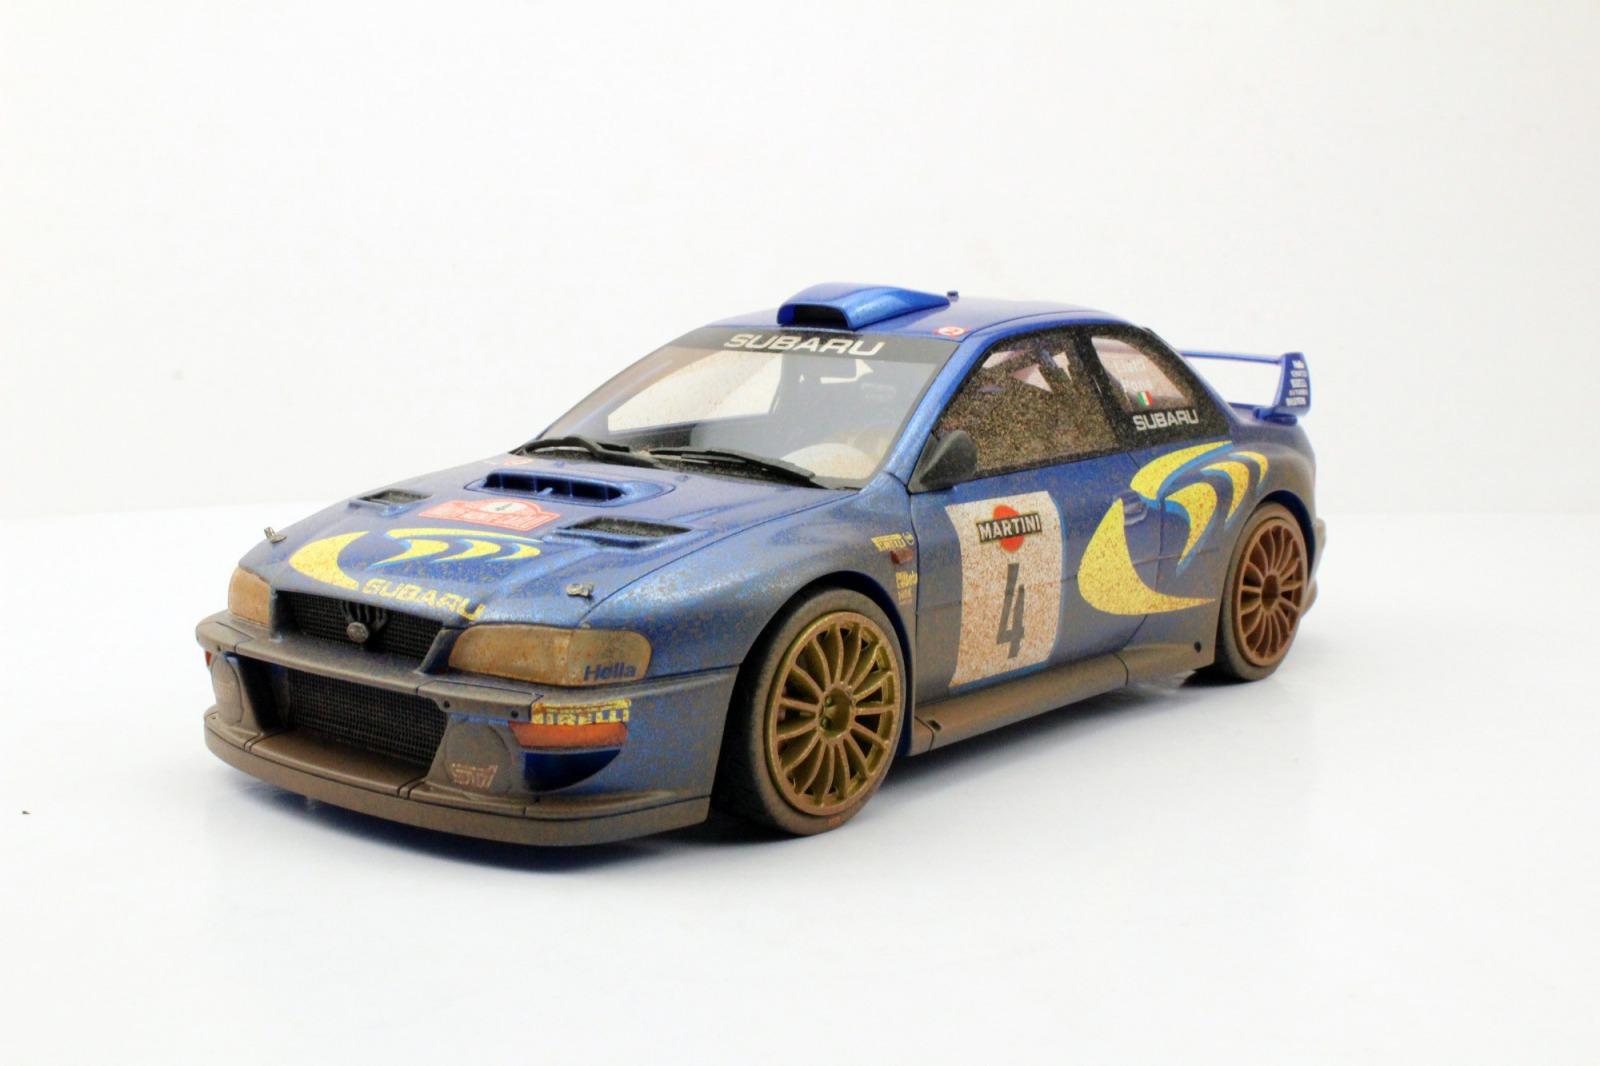 Top Marques トップマルケス 1/18 ミニカー レジン プロポーションモデル 1998年ラリーサンレモ2位 スバル インプレッサ S4 WRC No.4 汚れ仕様SUBARU - IMPREZA S4 WRC N 4 2nd RALLY SANREMO DIRTY VERSION 1998 P.LIATTI - F.PONS 1:18 Top Marques